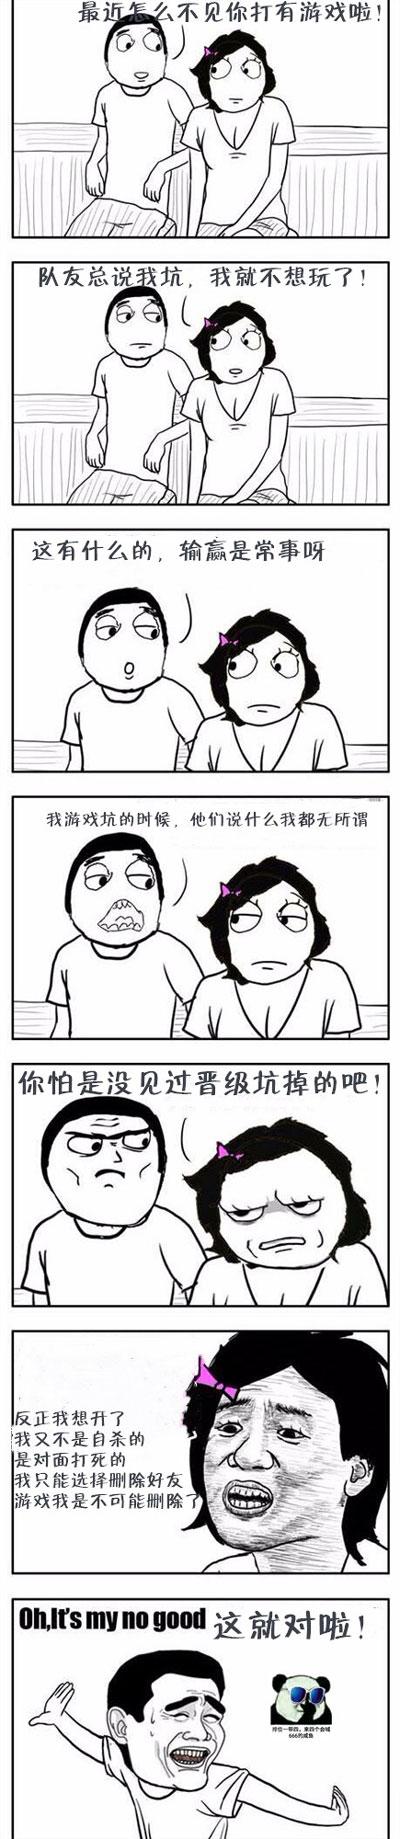 CF手游漫画三